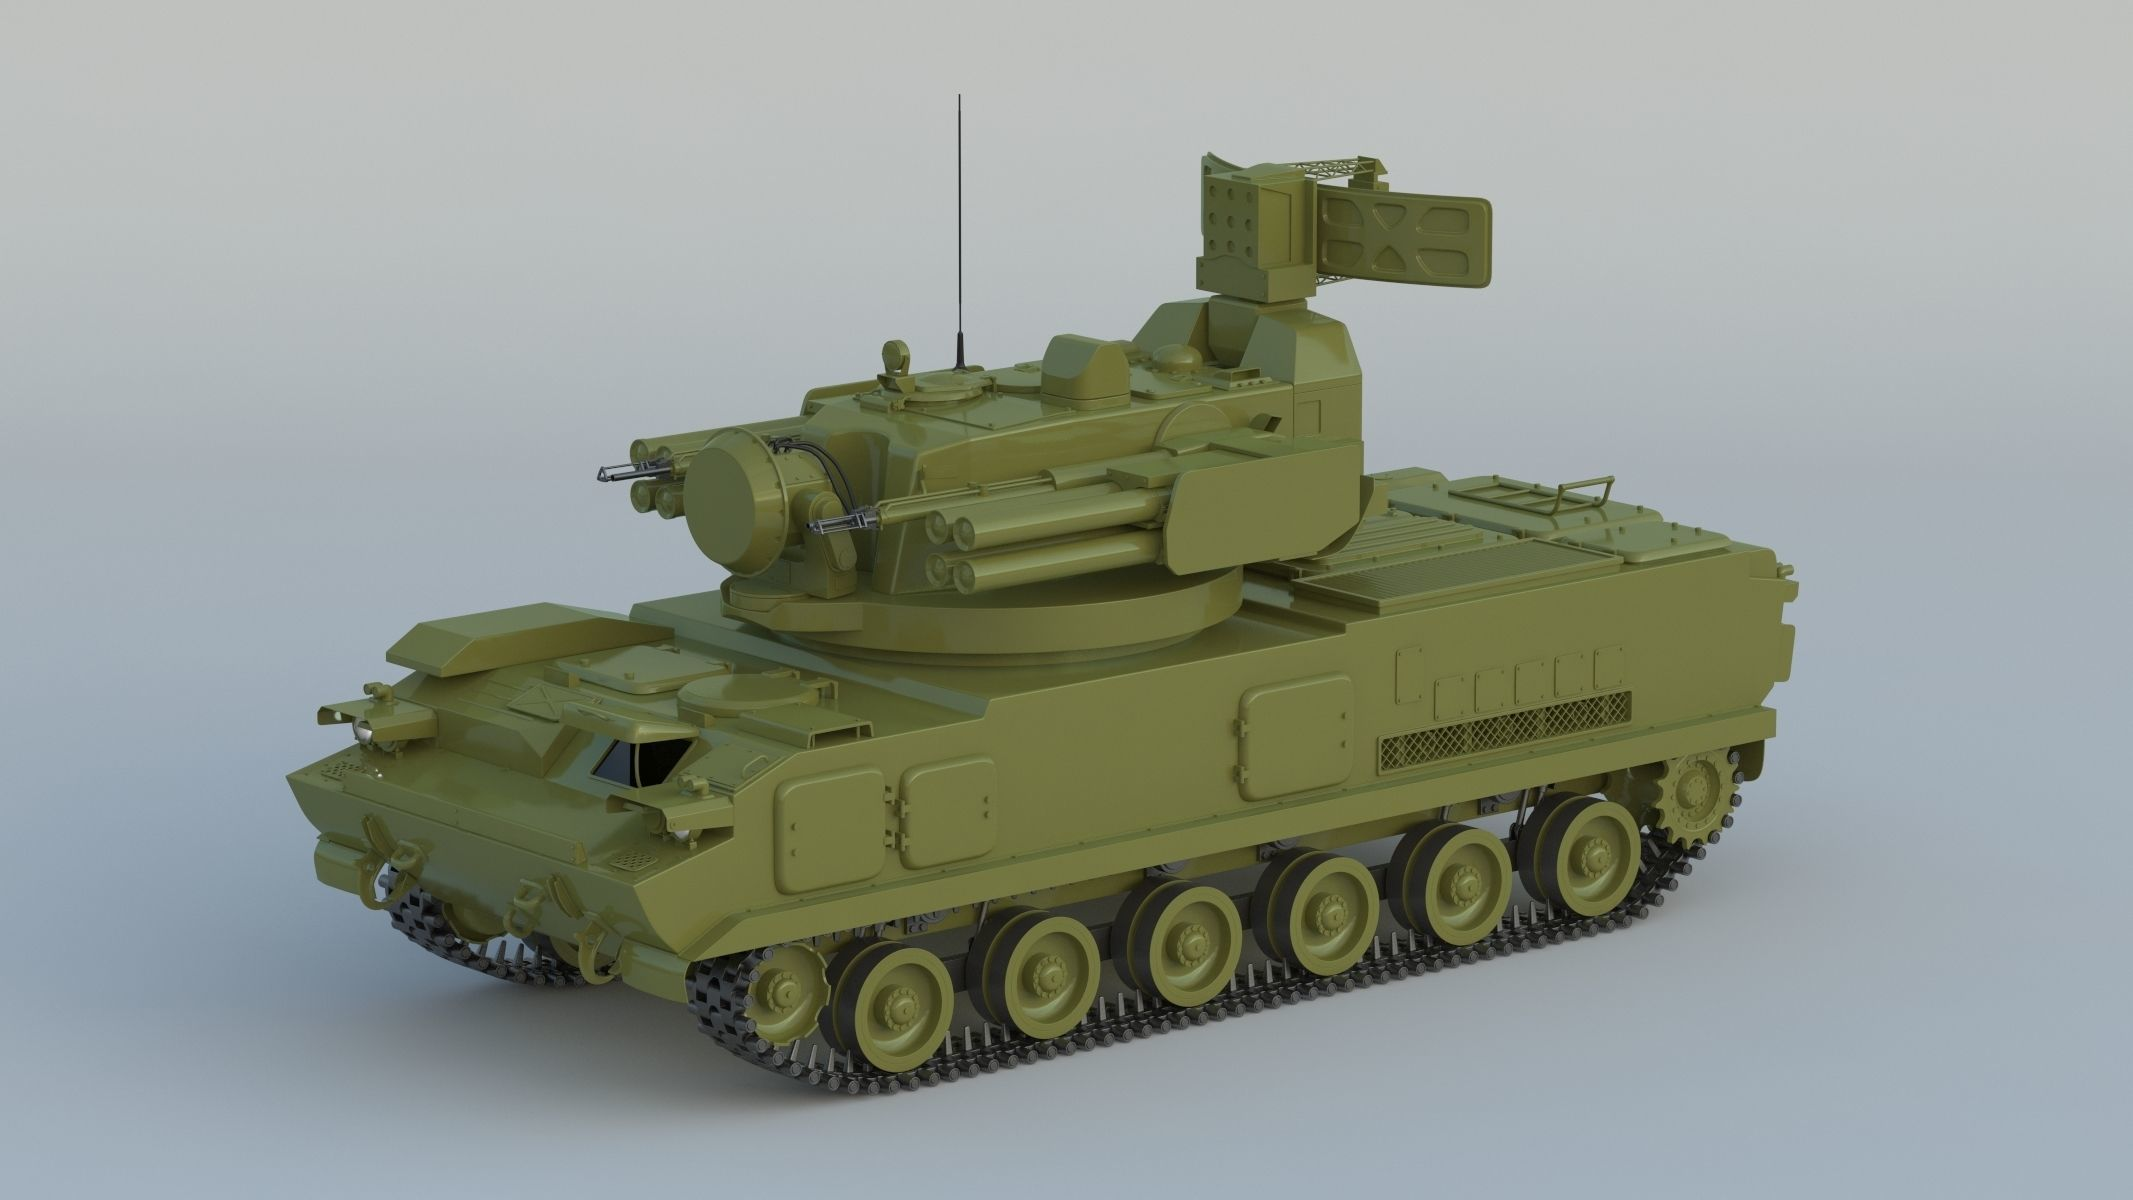 2K22 Tunguska SA-19 Grison